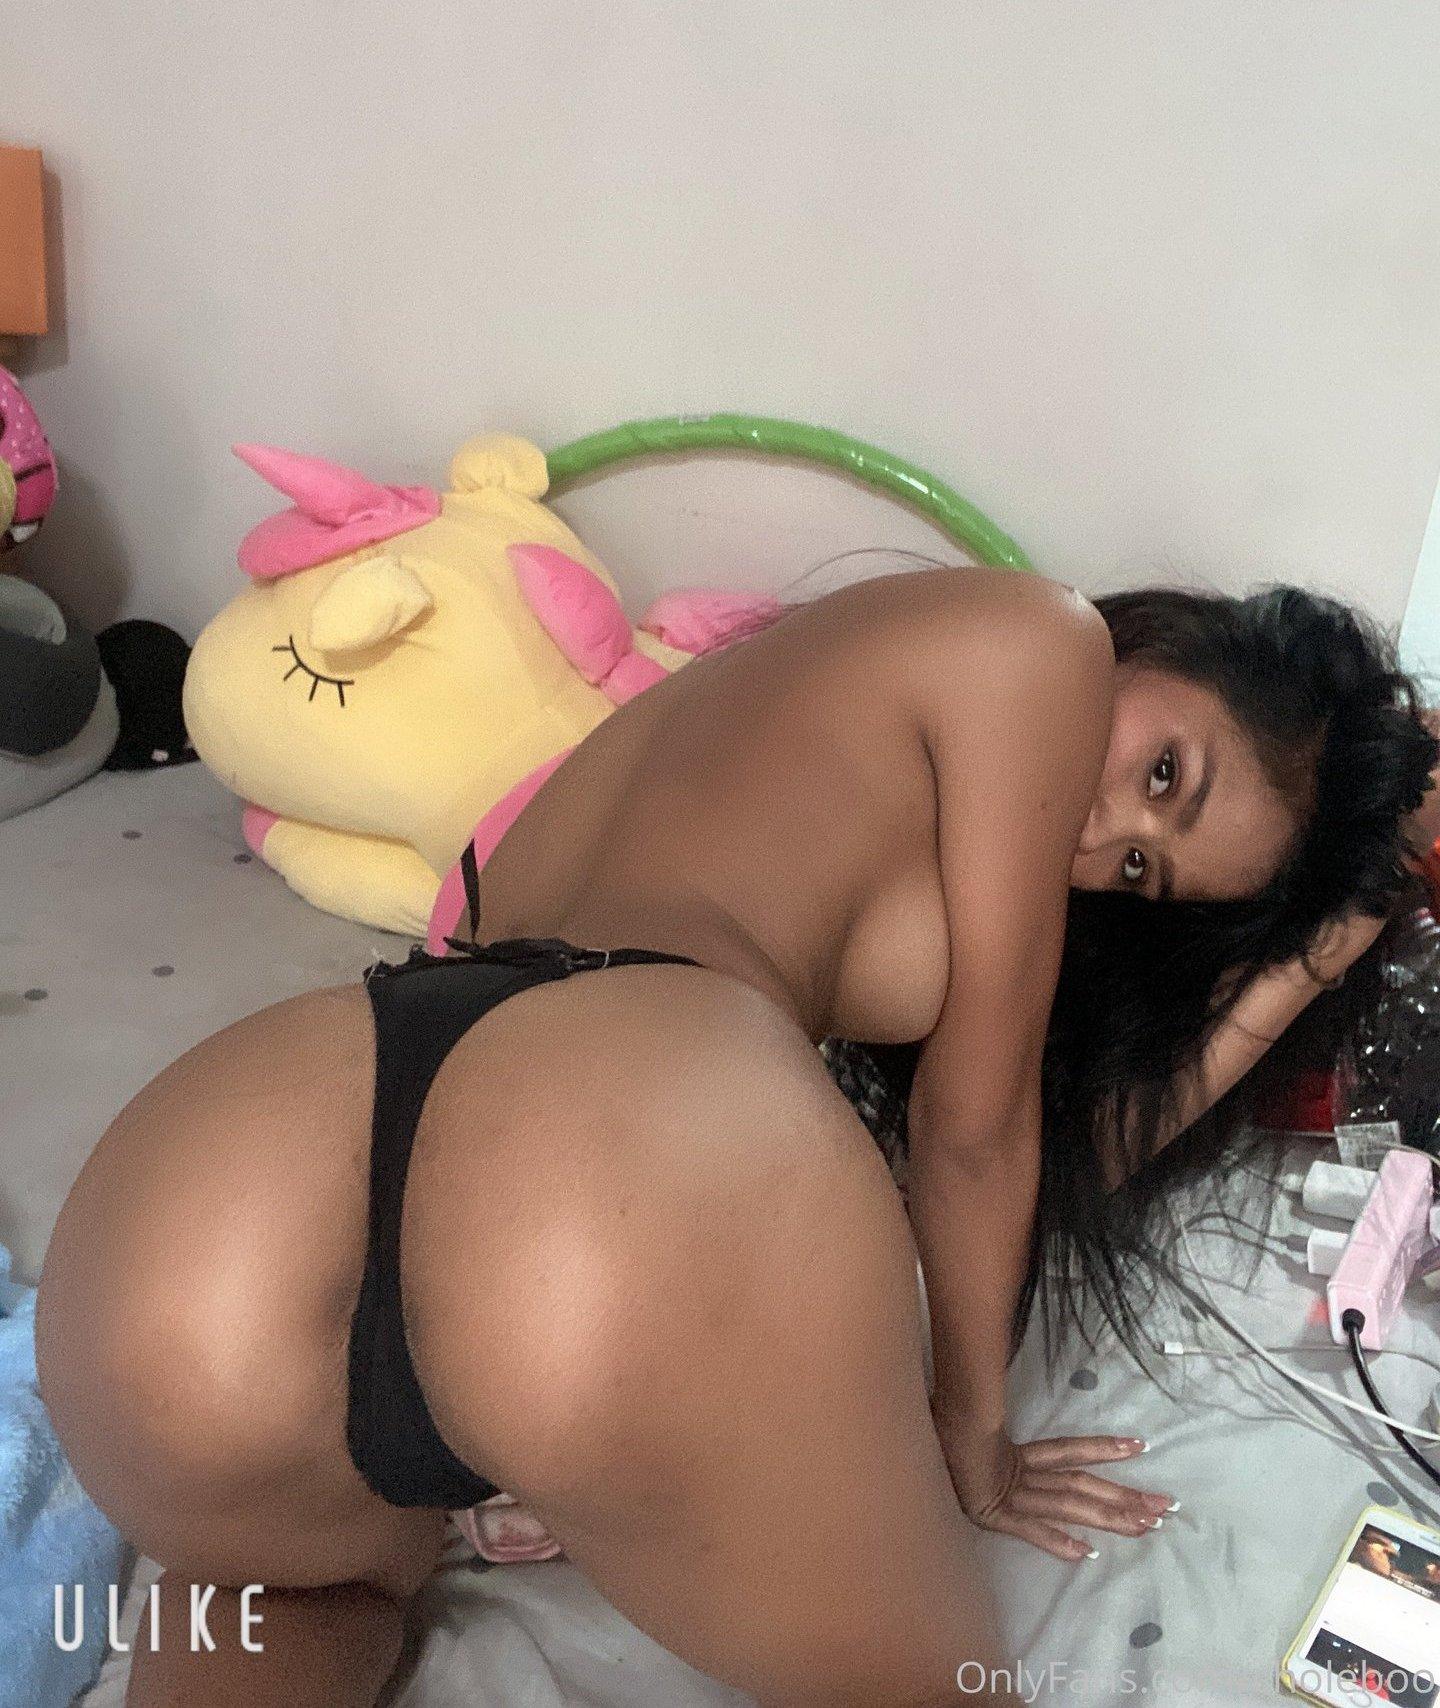 Chloe Choleboo Onlyfans Nude Leaks 0037